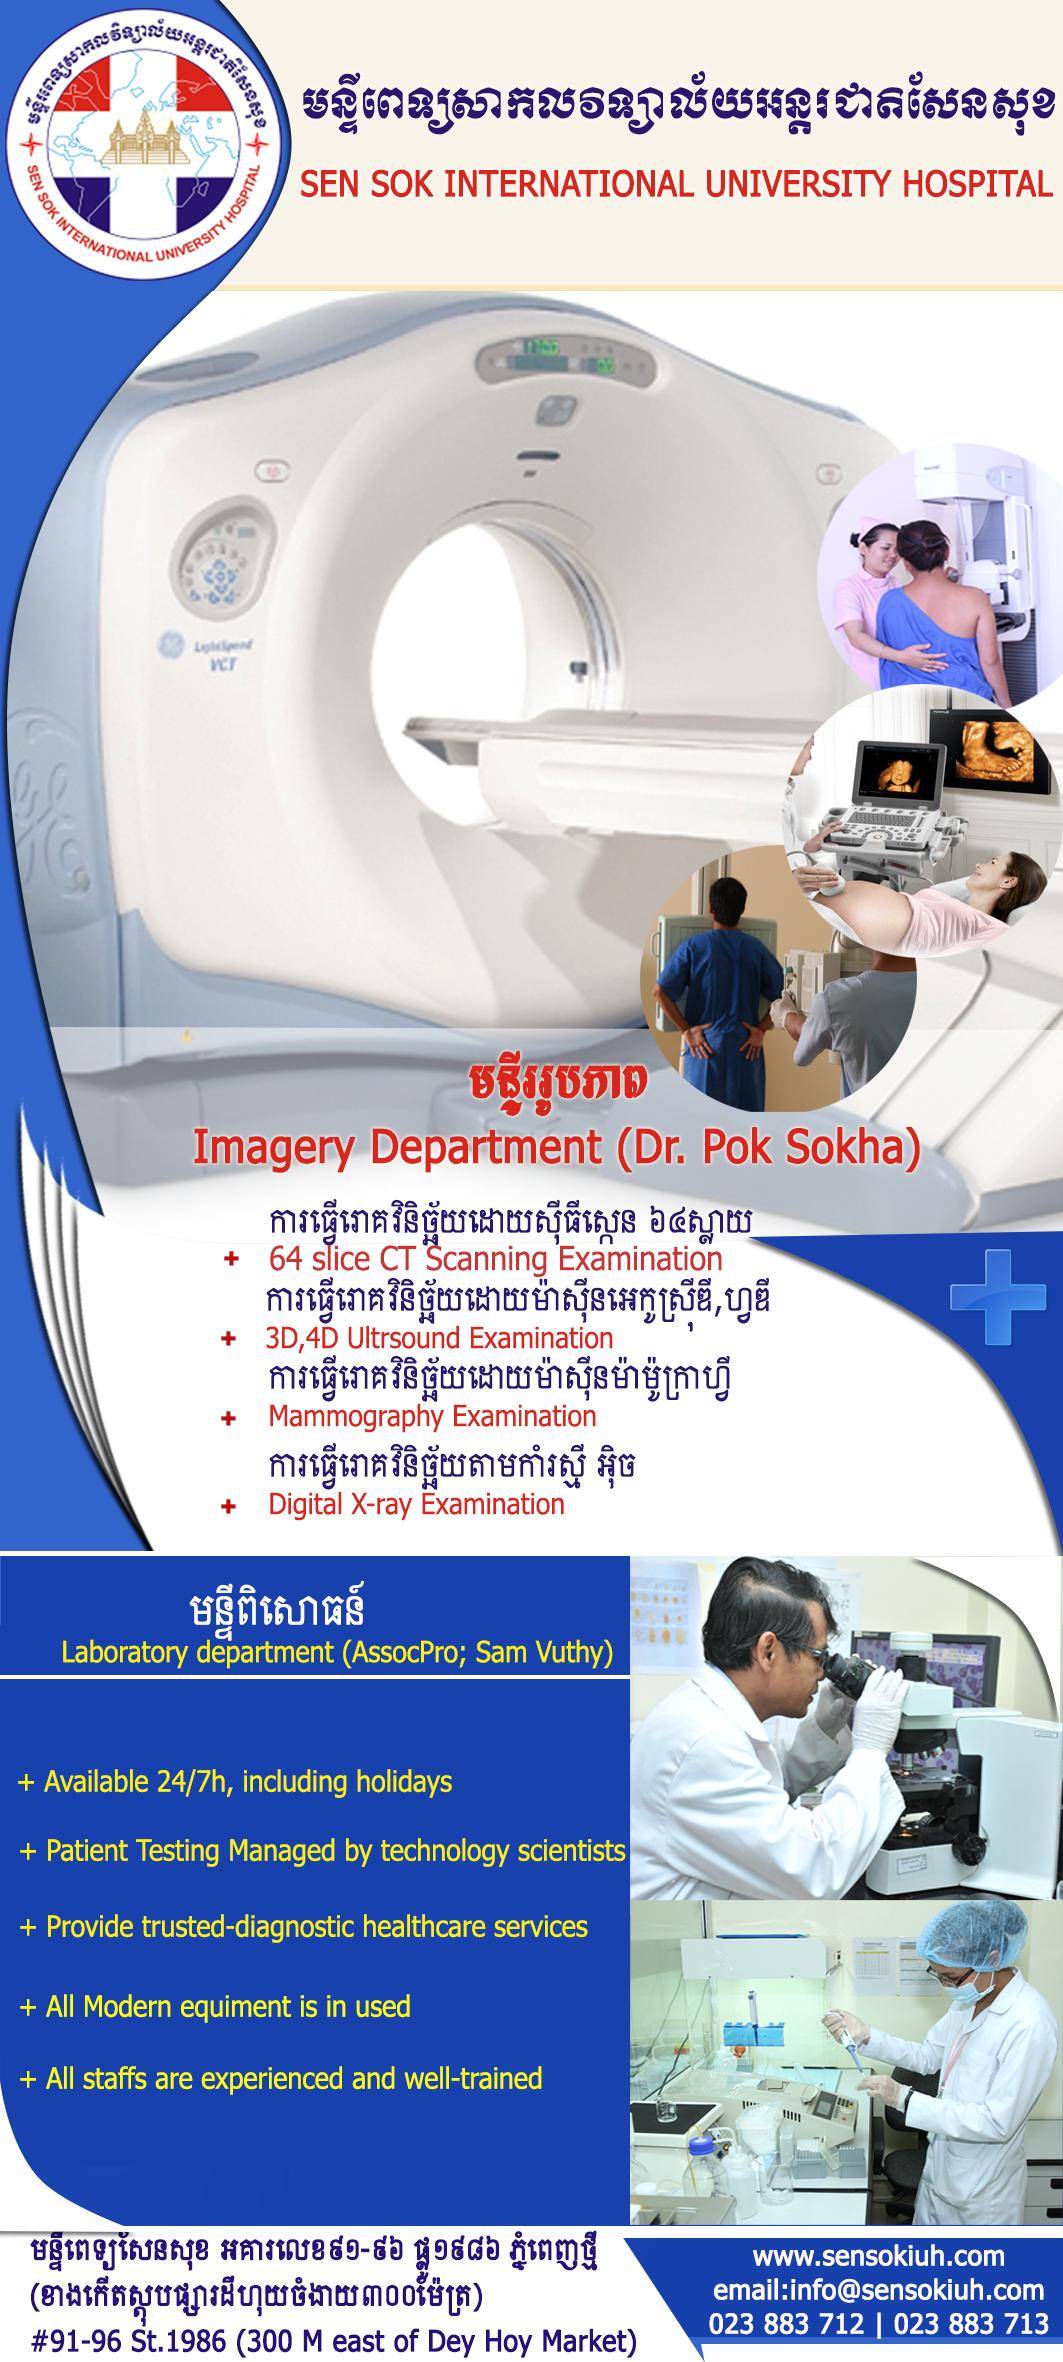 Sen Sok International University HospitalSen Sok